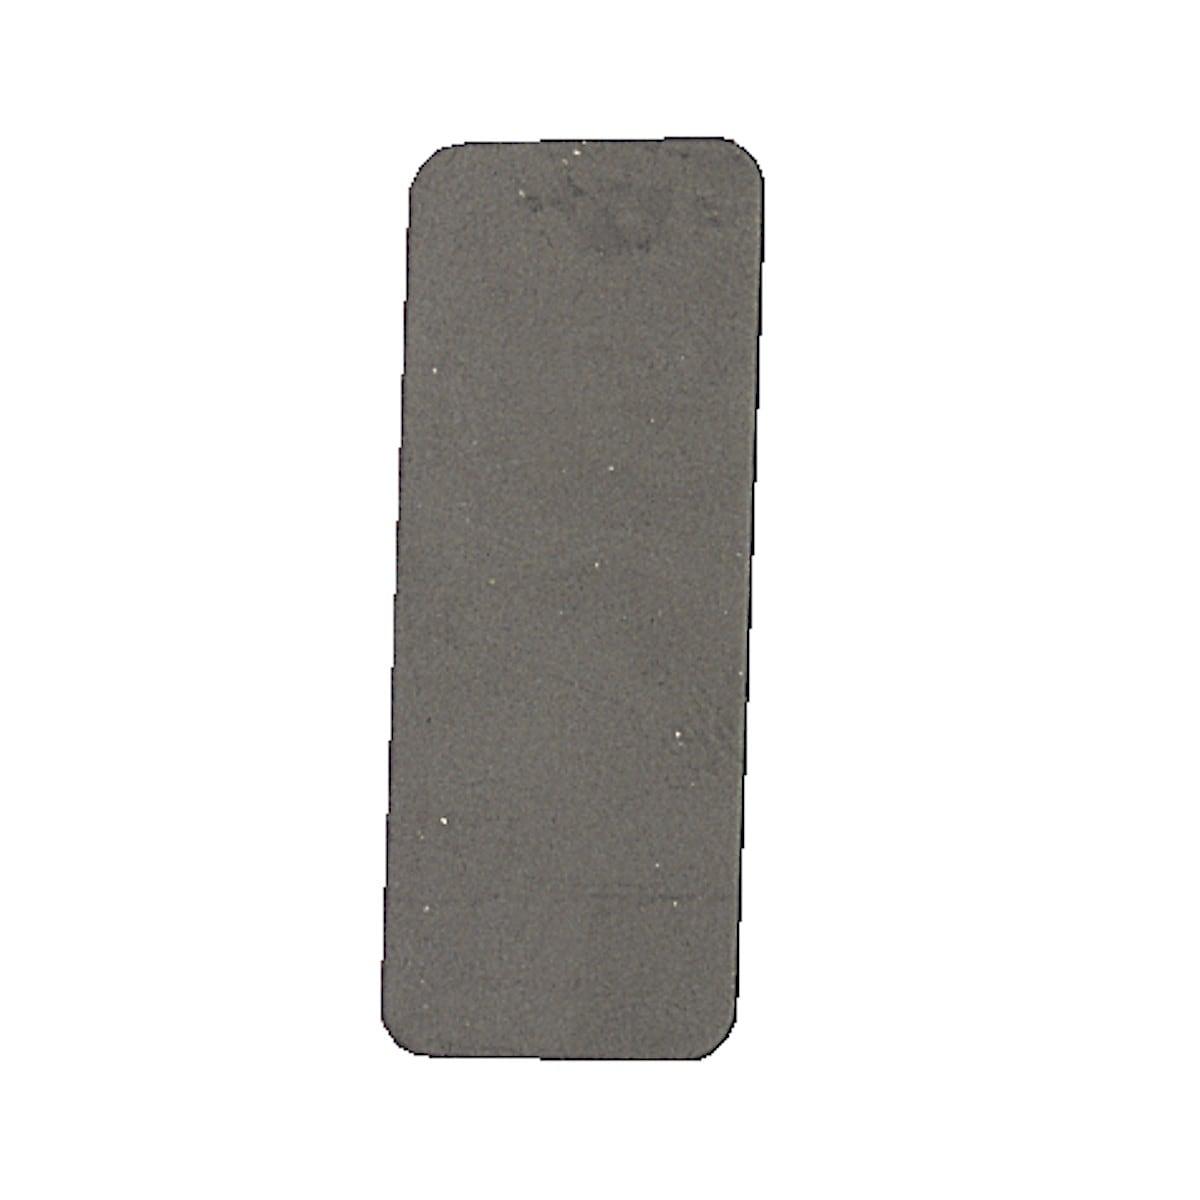 Metallilevy